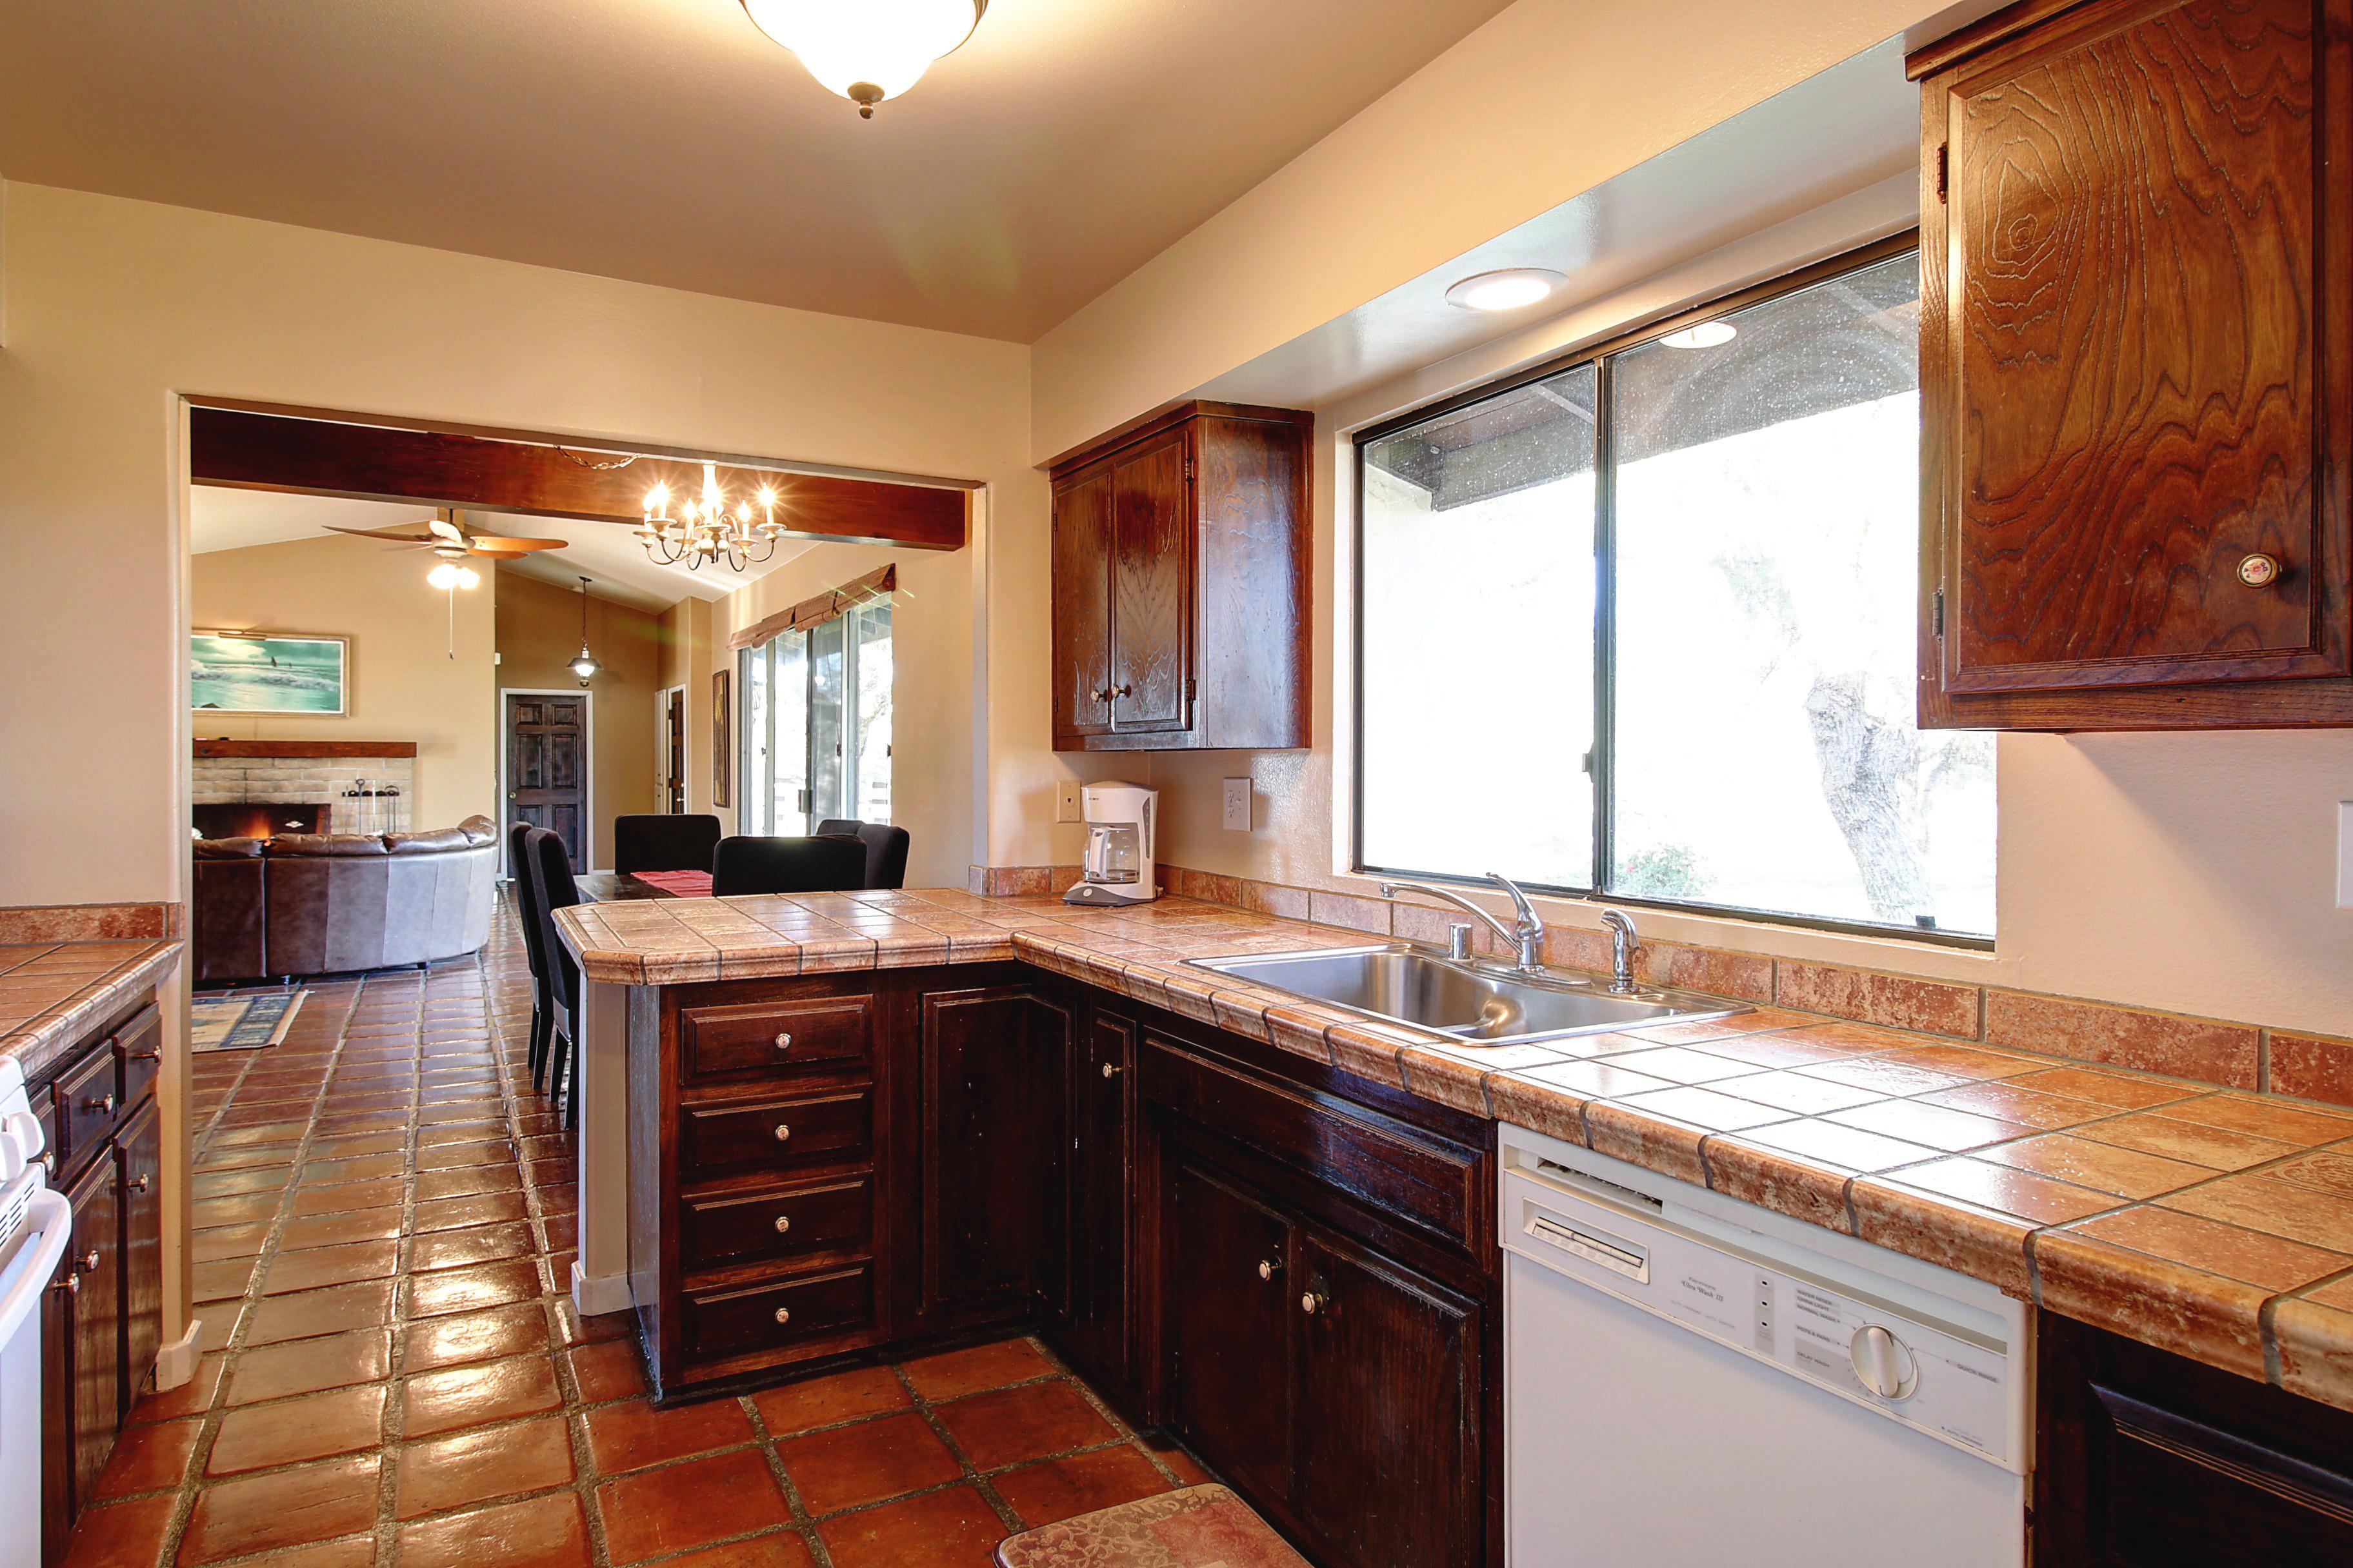 Santa Ynez Ranch On 20 Acres Vacation Rental In Santa Ynez   RedAwning